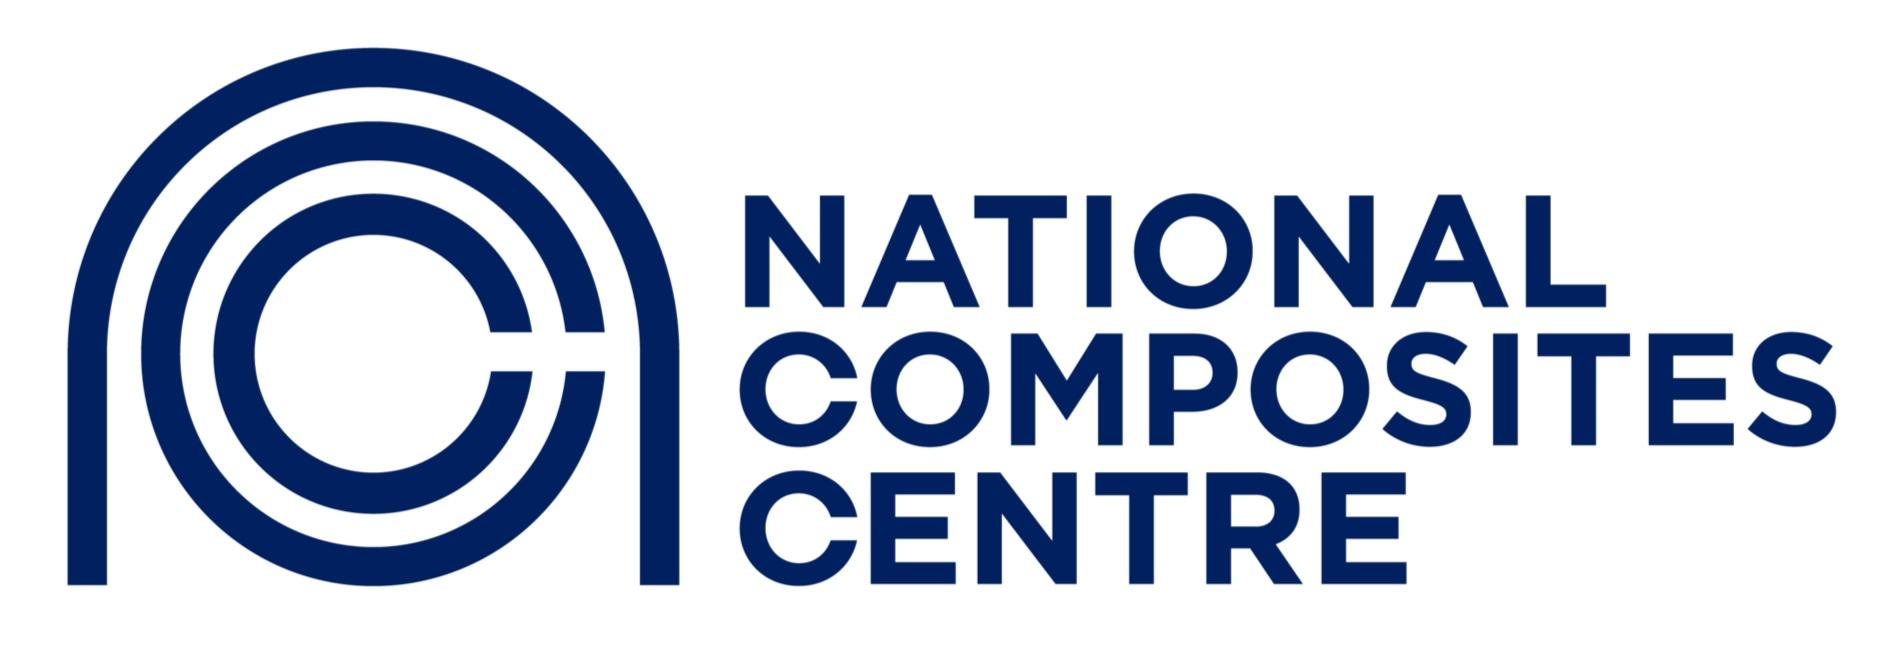 NCC-Main-logo-RGB_Full Colour.png